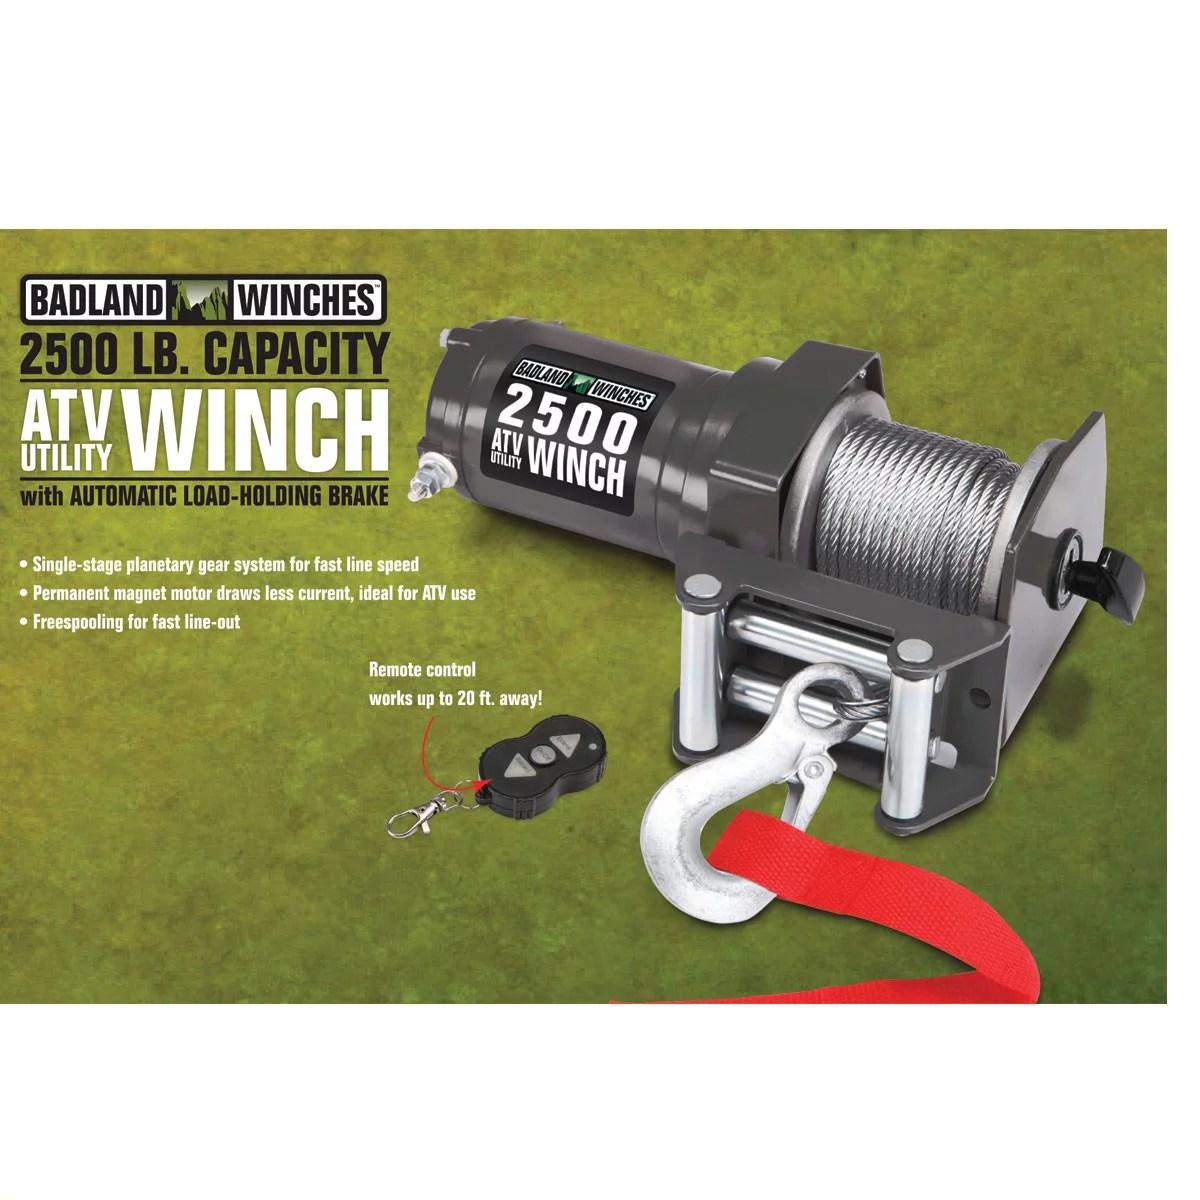 hight resolution of badland electric winch 2500 lb atv utility wireless remote control 61840 walmart com